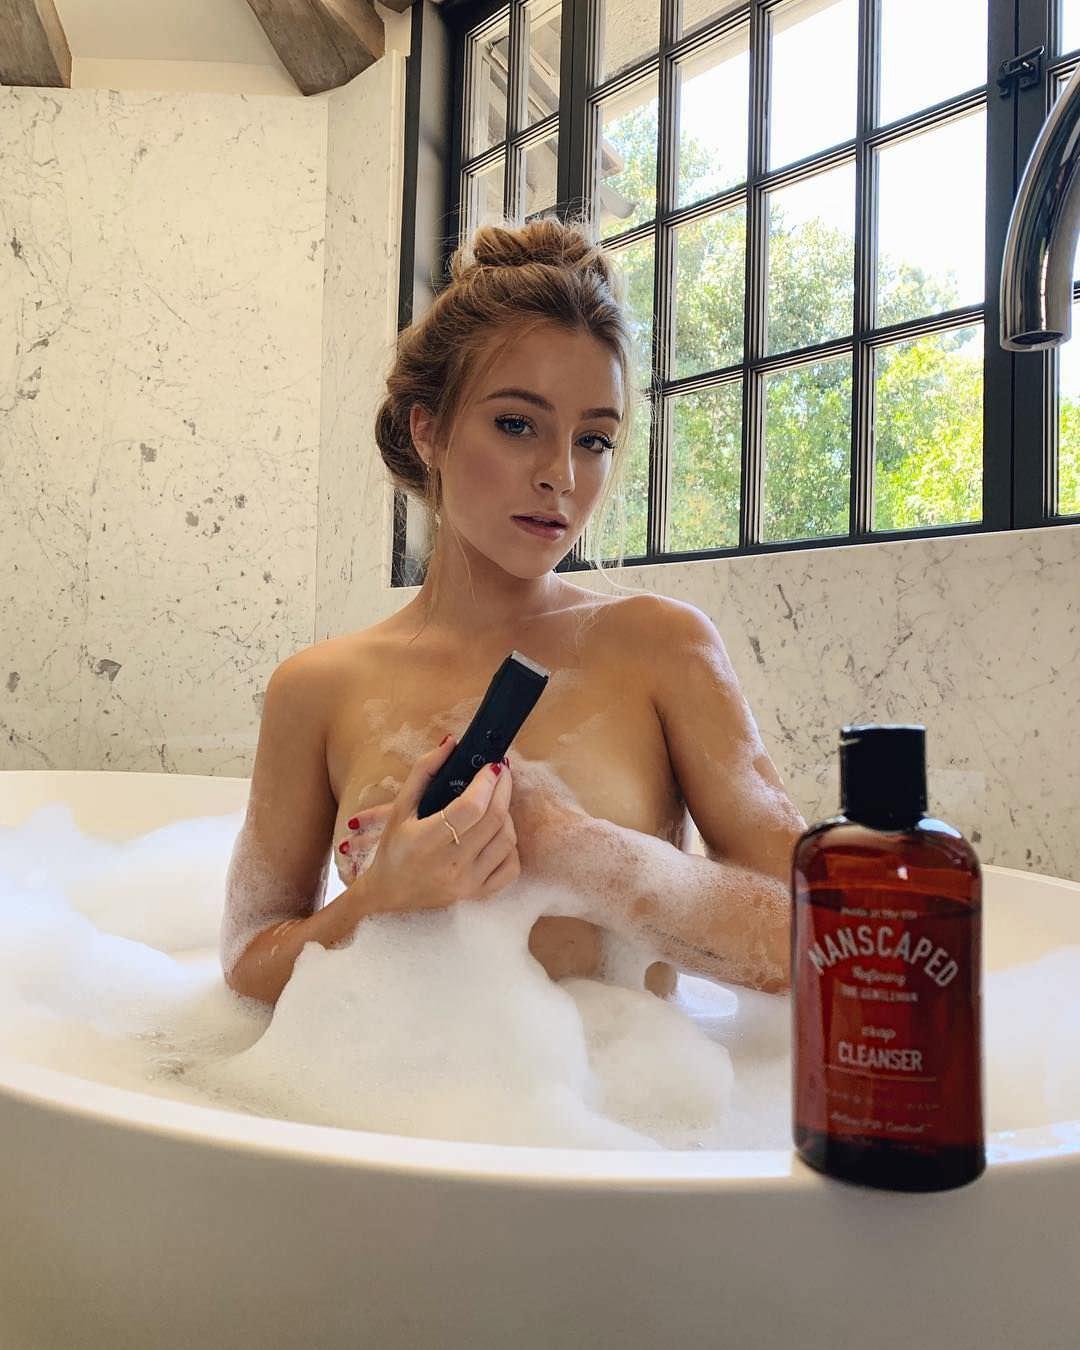 Дейзи Кич фото в ванной